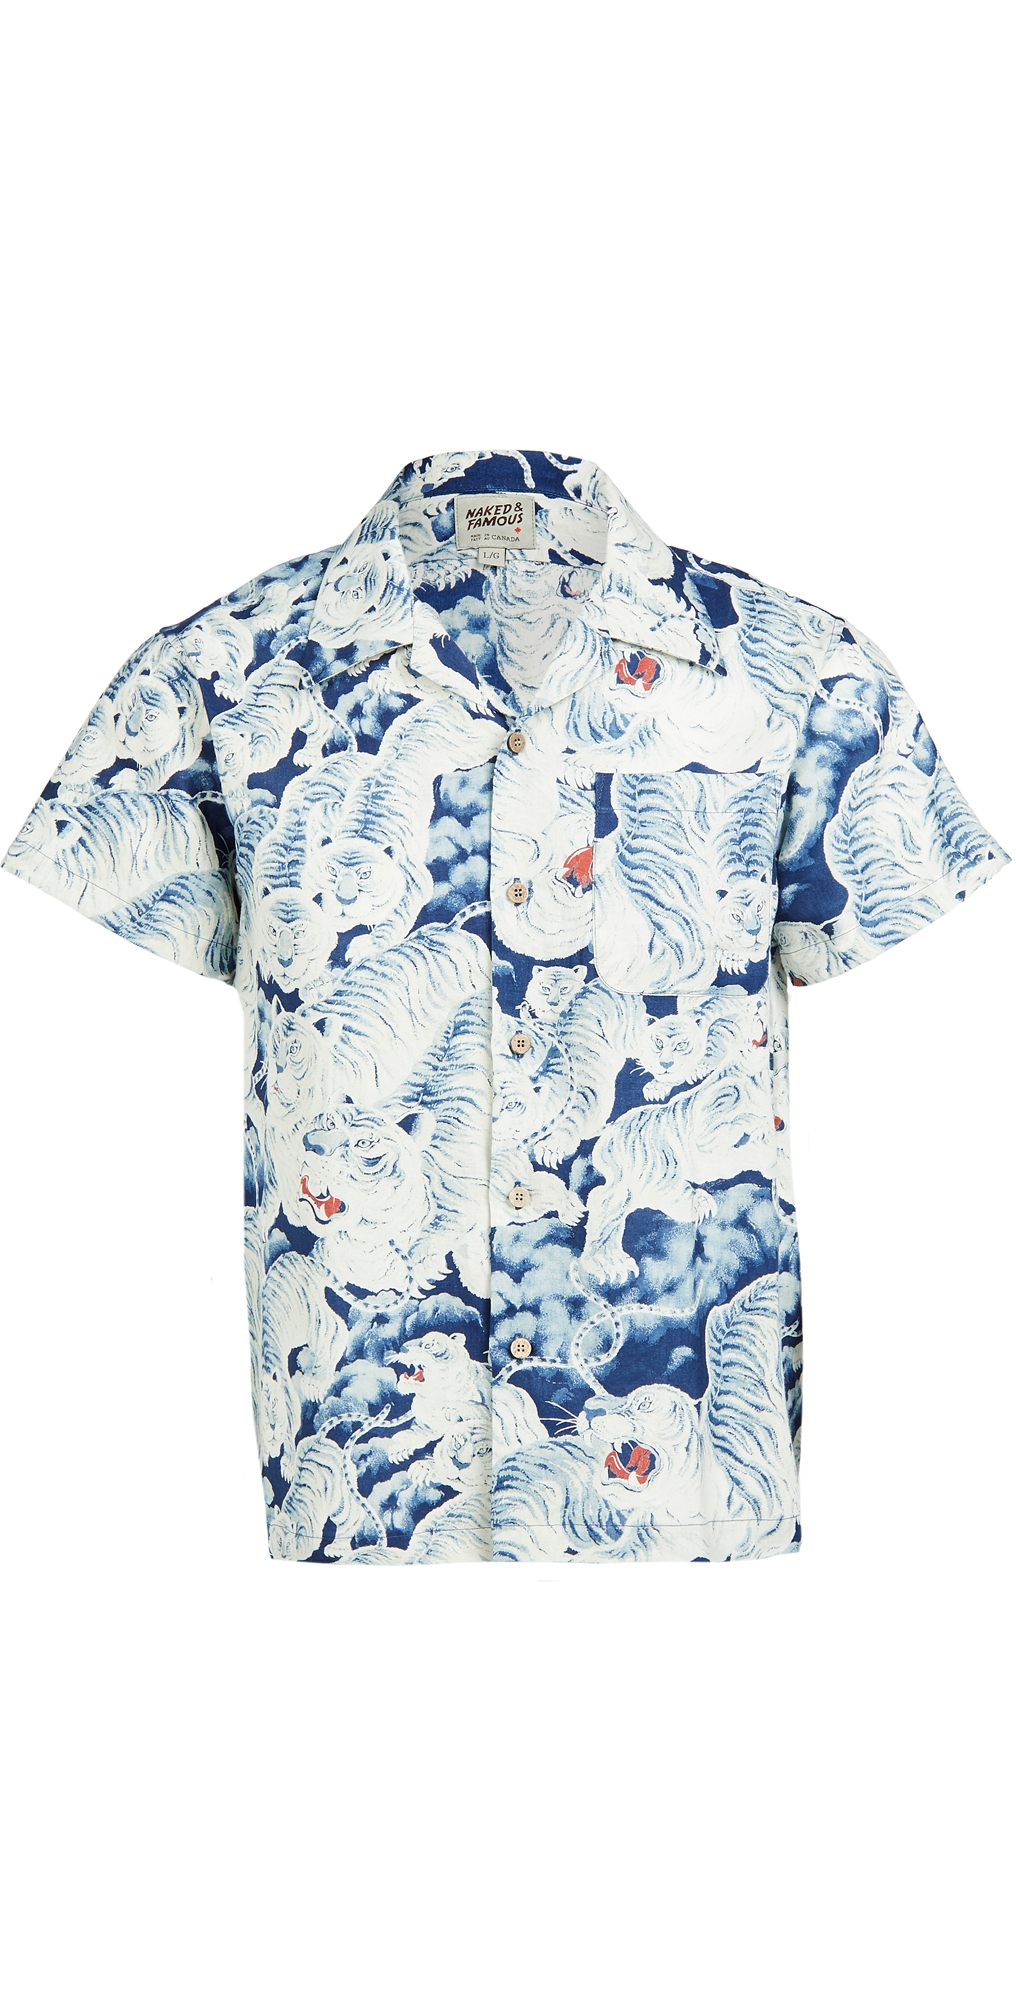 Naked & Famous Indigo Tigers Aloha Shirt